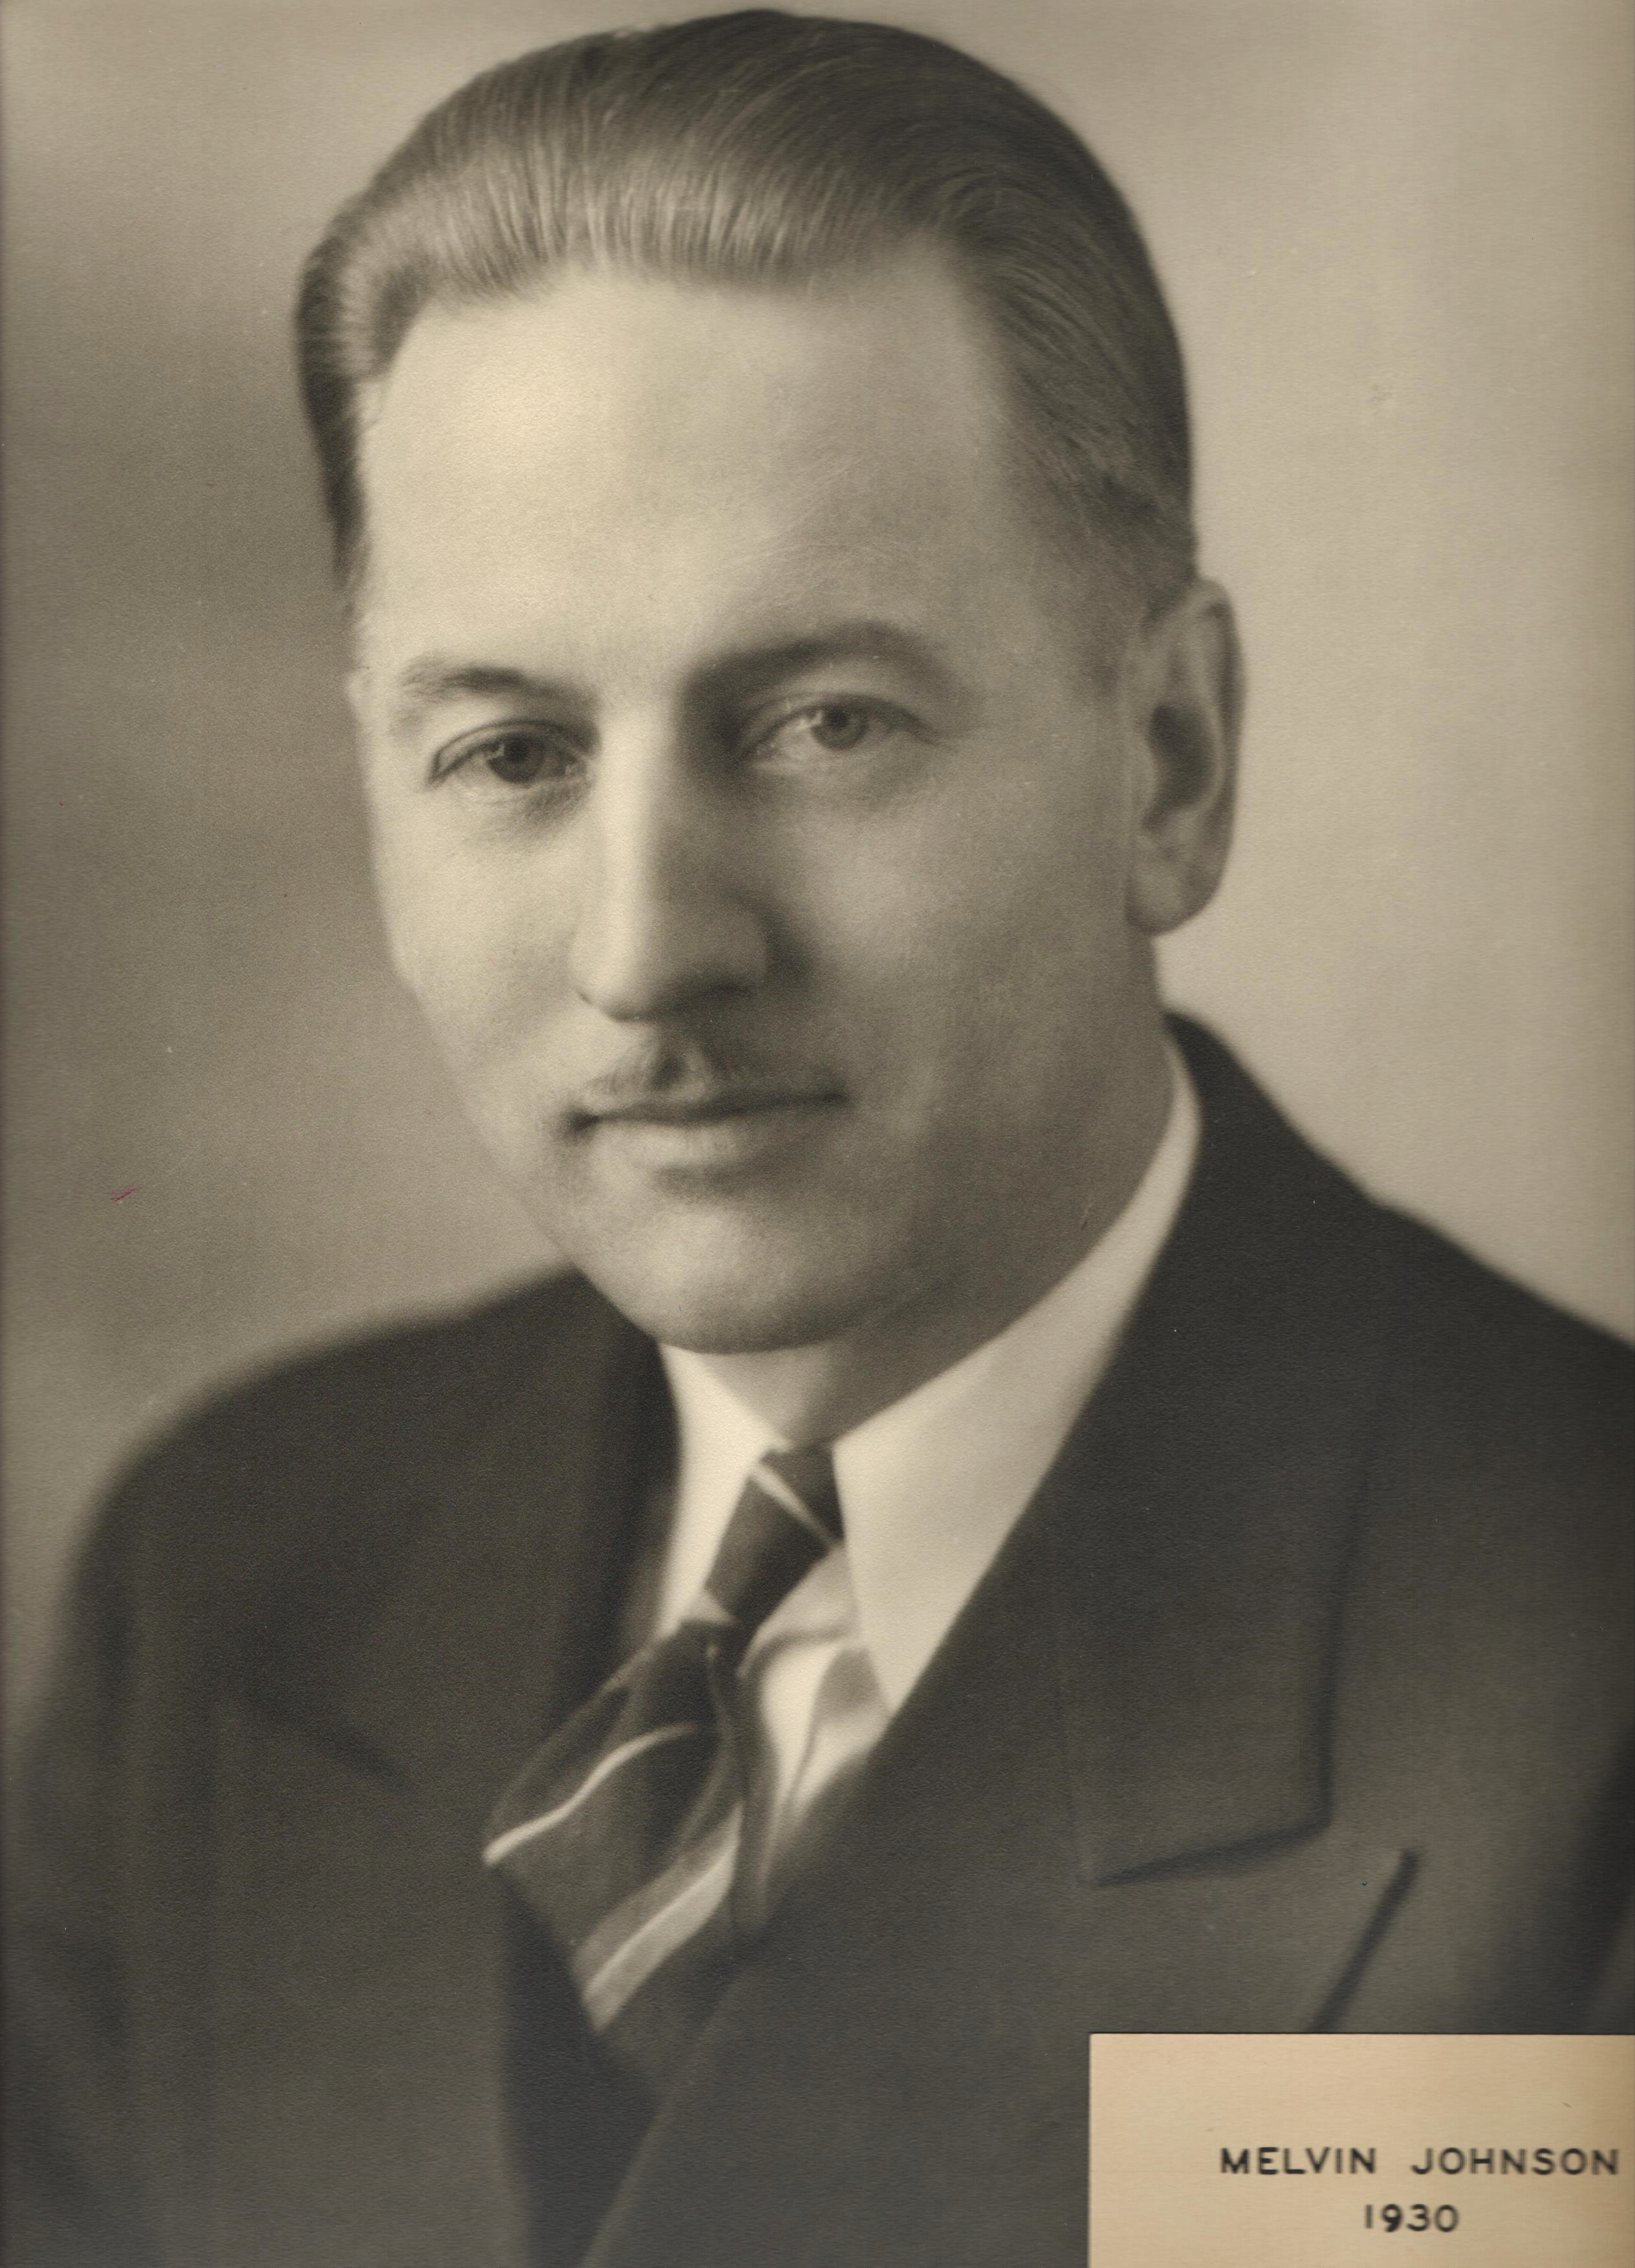 1930 Melvin Johnson